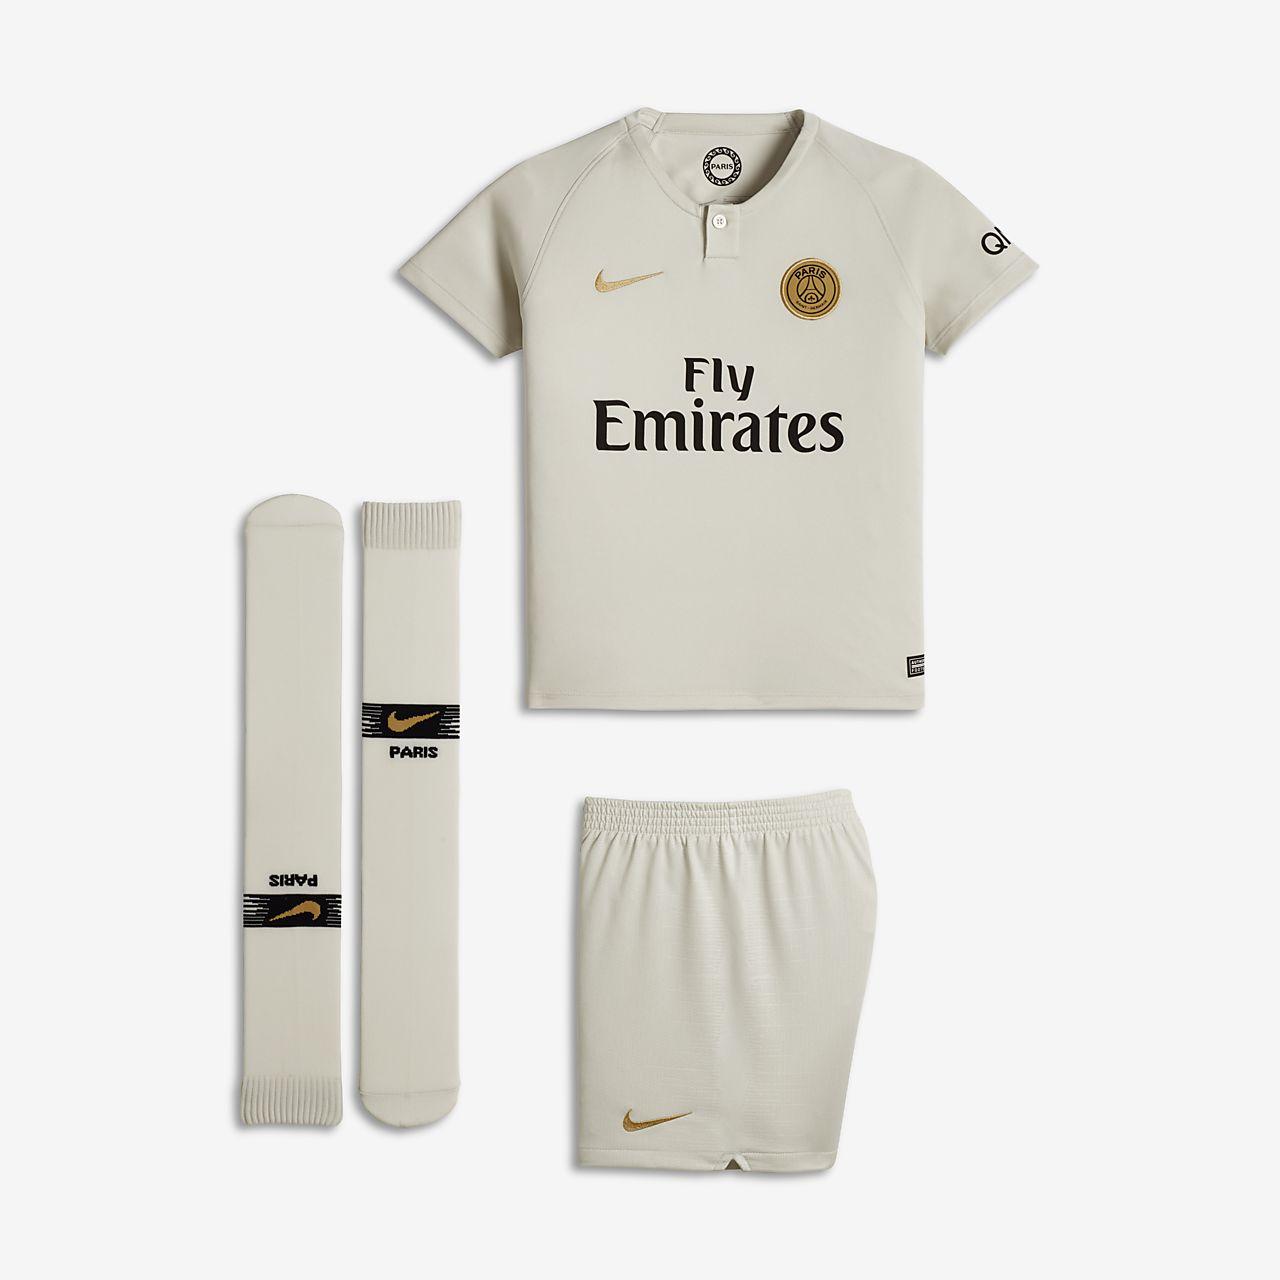 8813d0d44c ... Kit de fútbol de visitante Stadium del Paris Saint-Germain 2018 19 para  niños